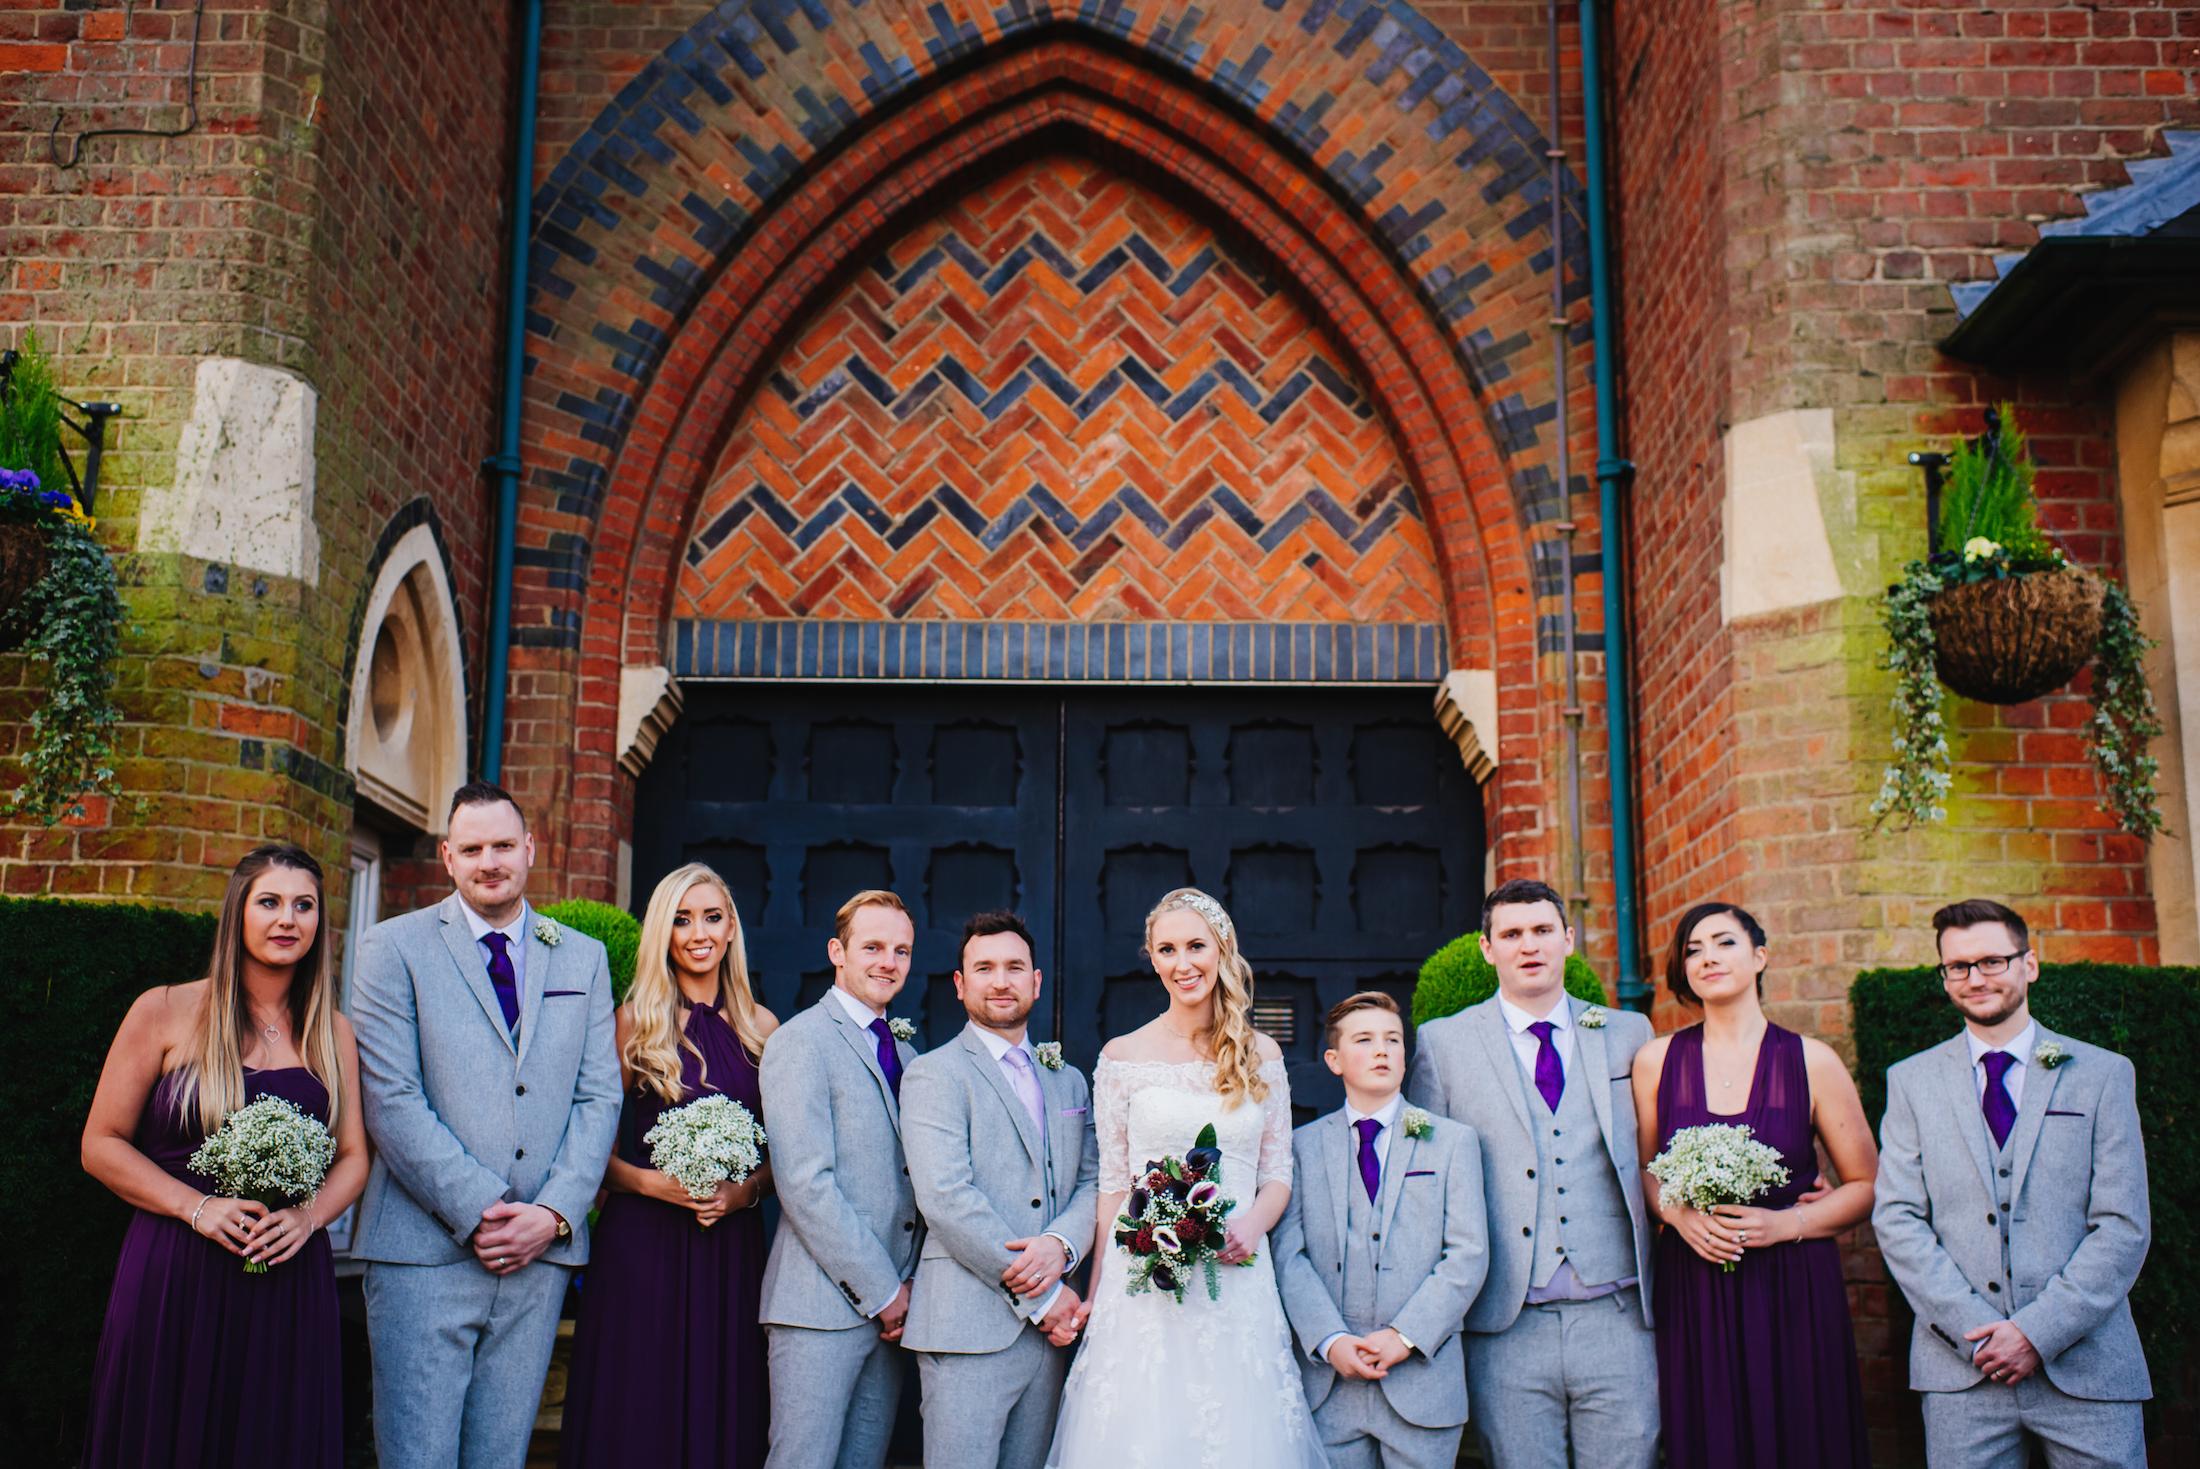 121 Bride Groom London Wedding Photography.jpg